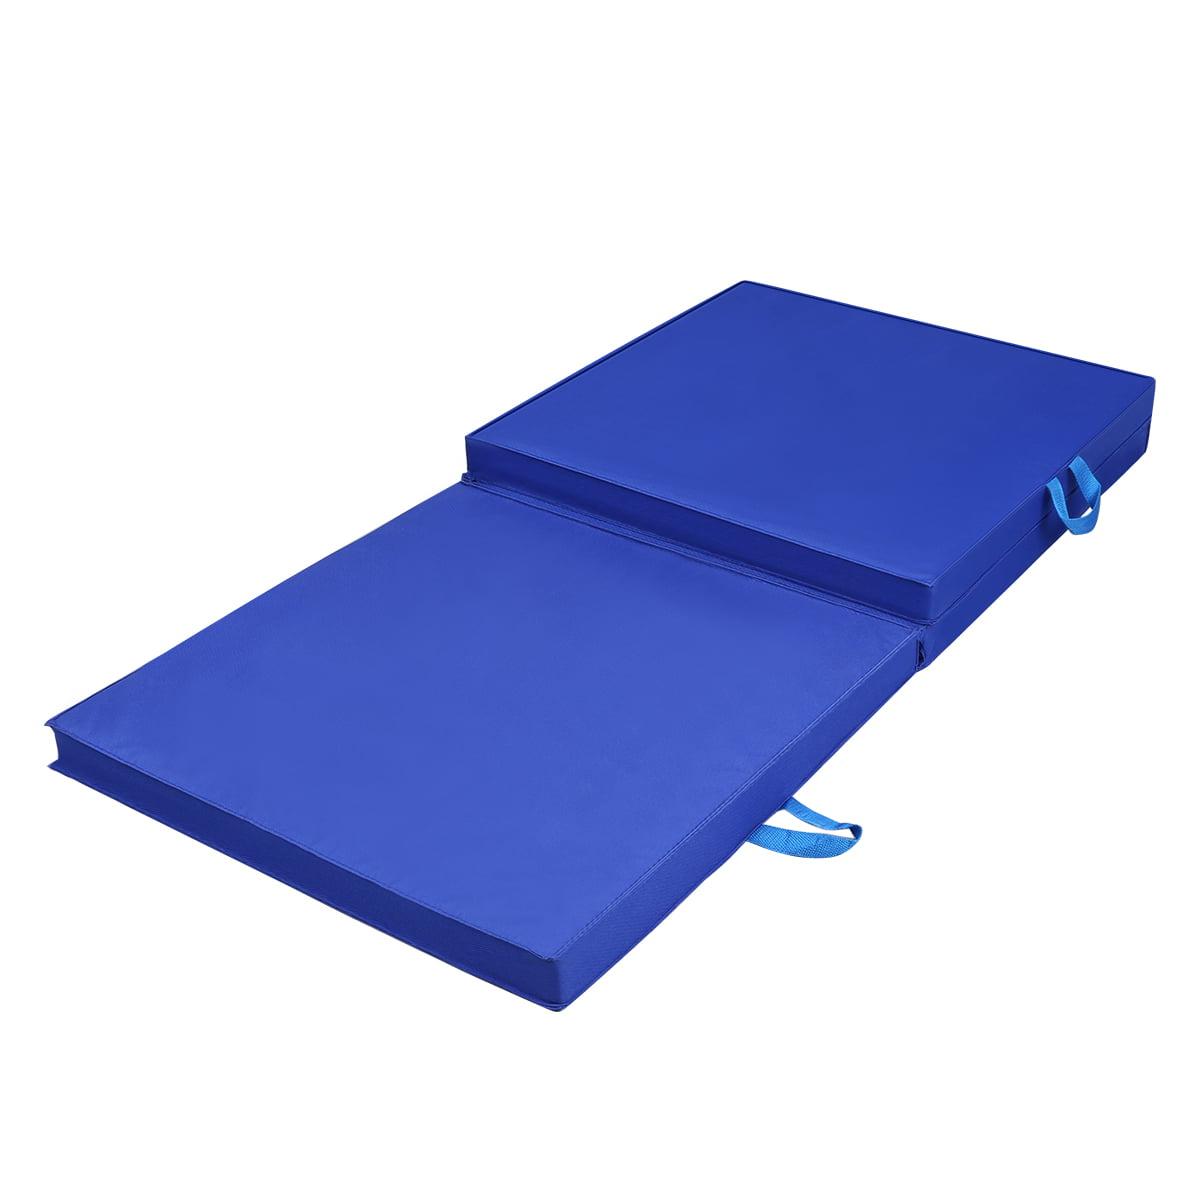 3 Folding Exercise Floor Mat Gymnastics Mats 5cm Thick Tri ...